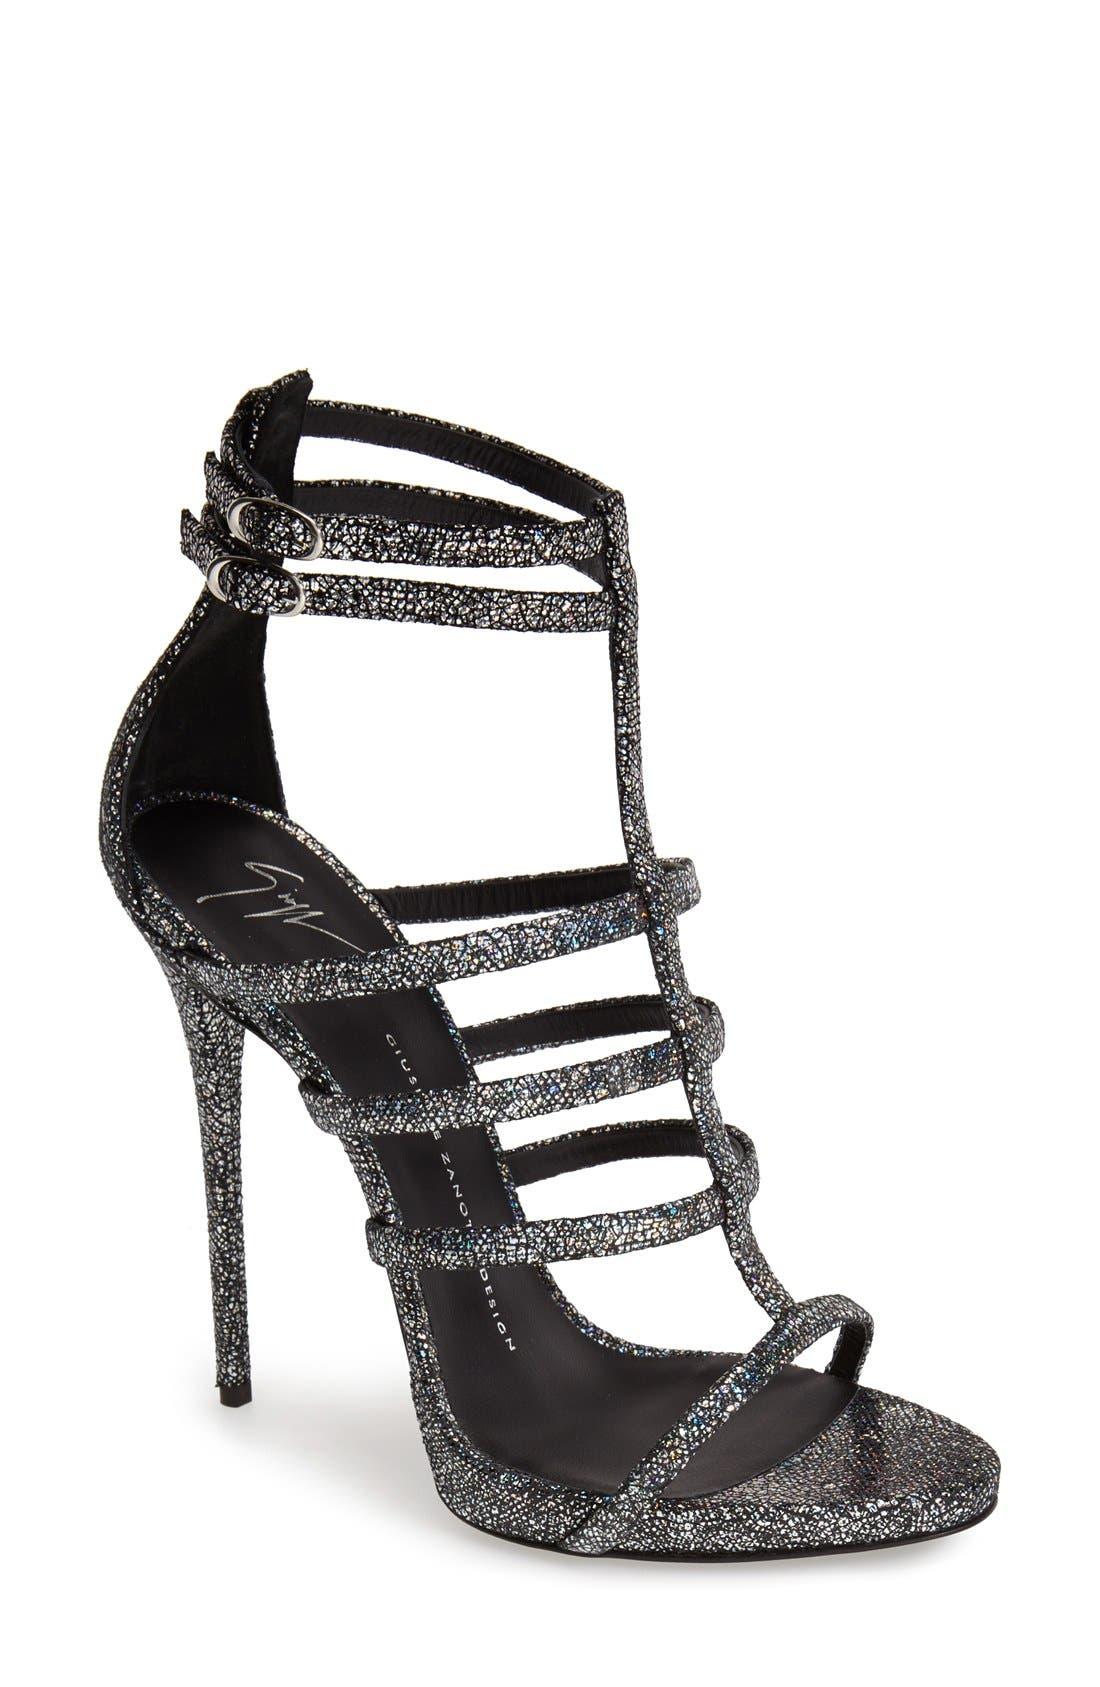 Alternate Image 1 Selected - Giuseppe Zanotti Metallic Strappy Sandal (Women)